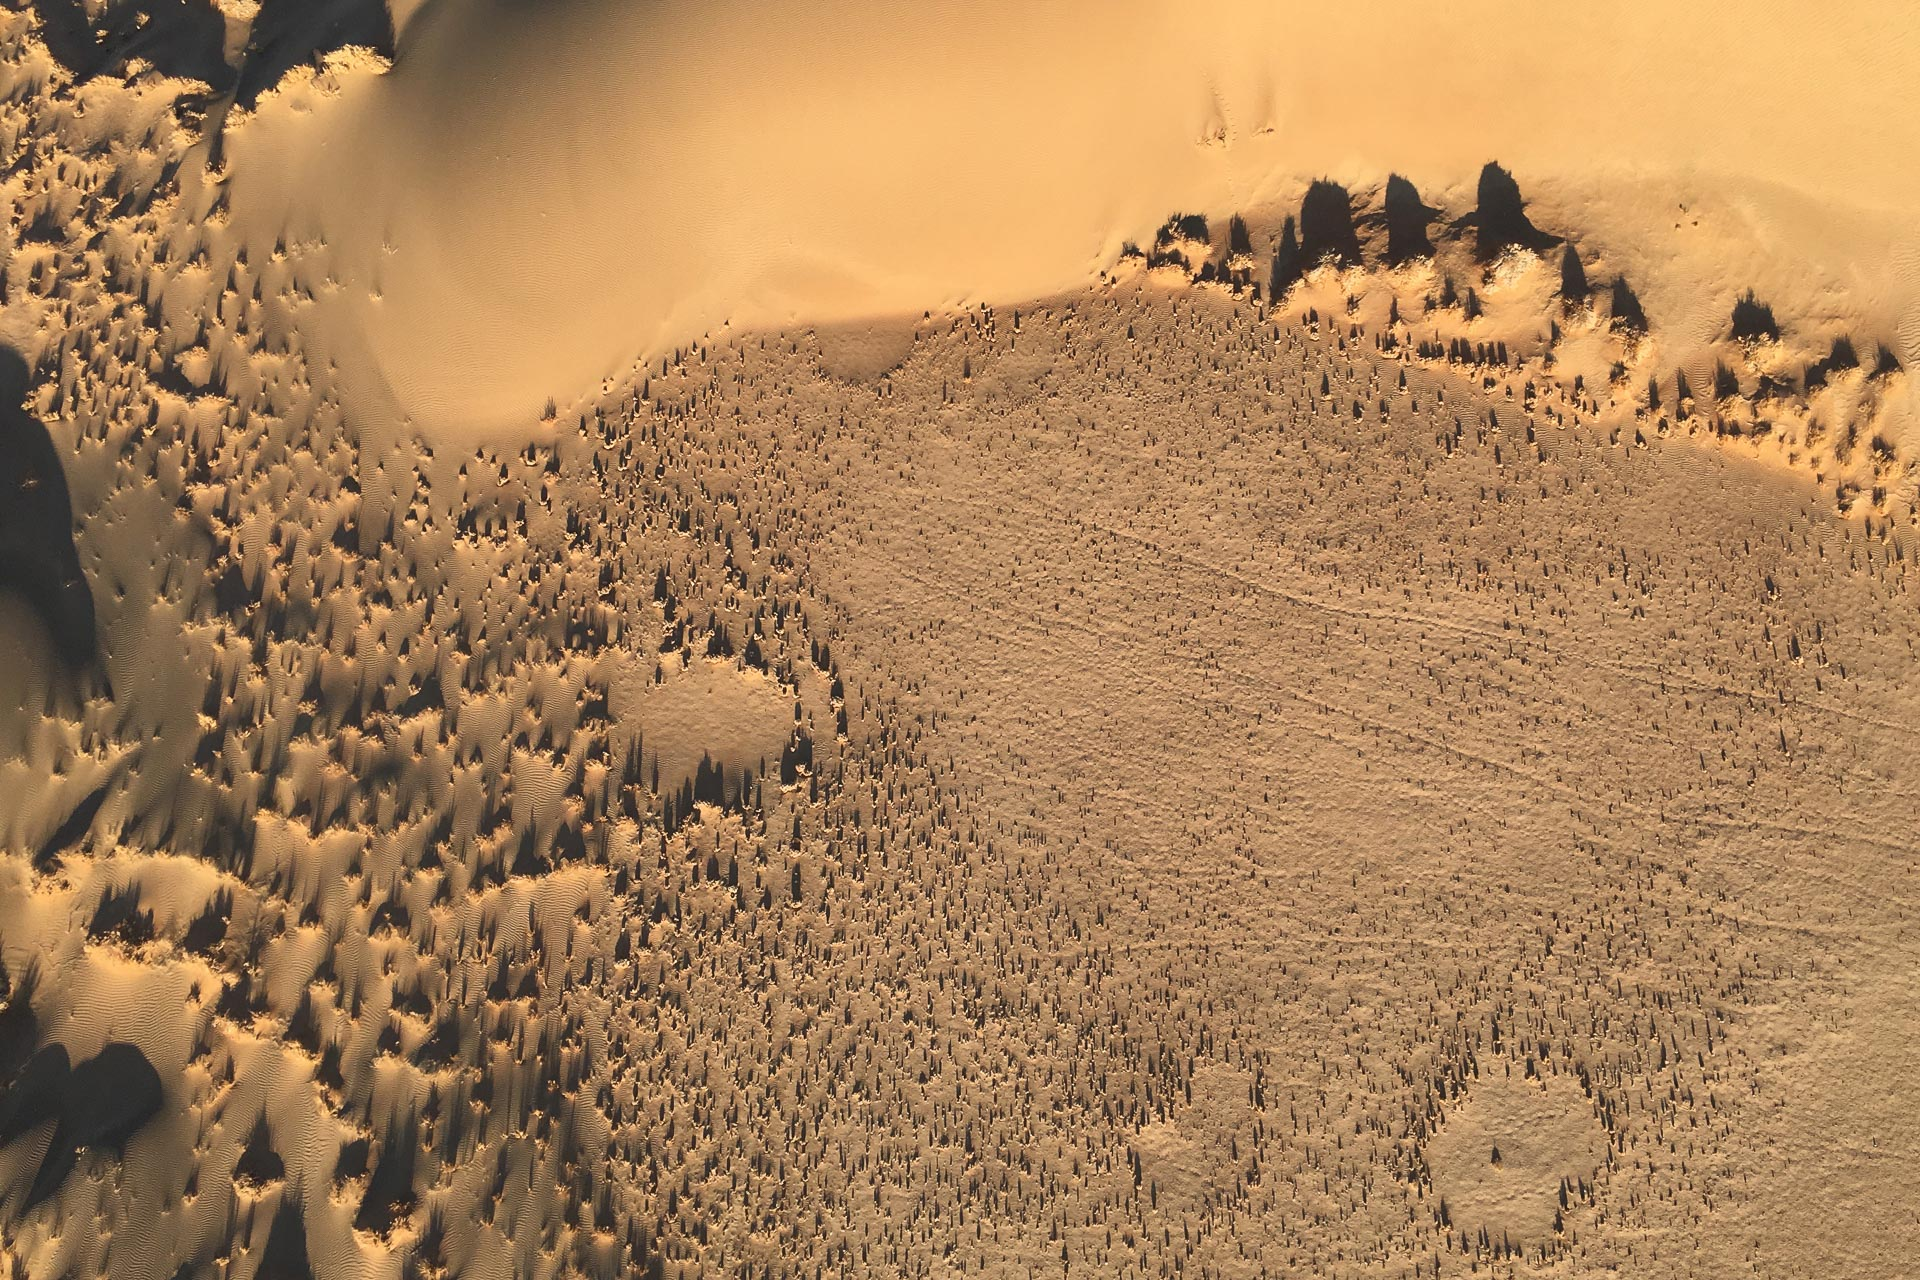 Namib-Ballonfahrt-Wueste-Namibia-Globetrotter-Select-7